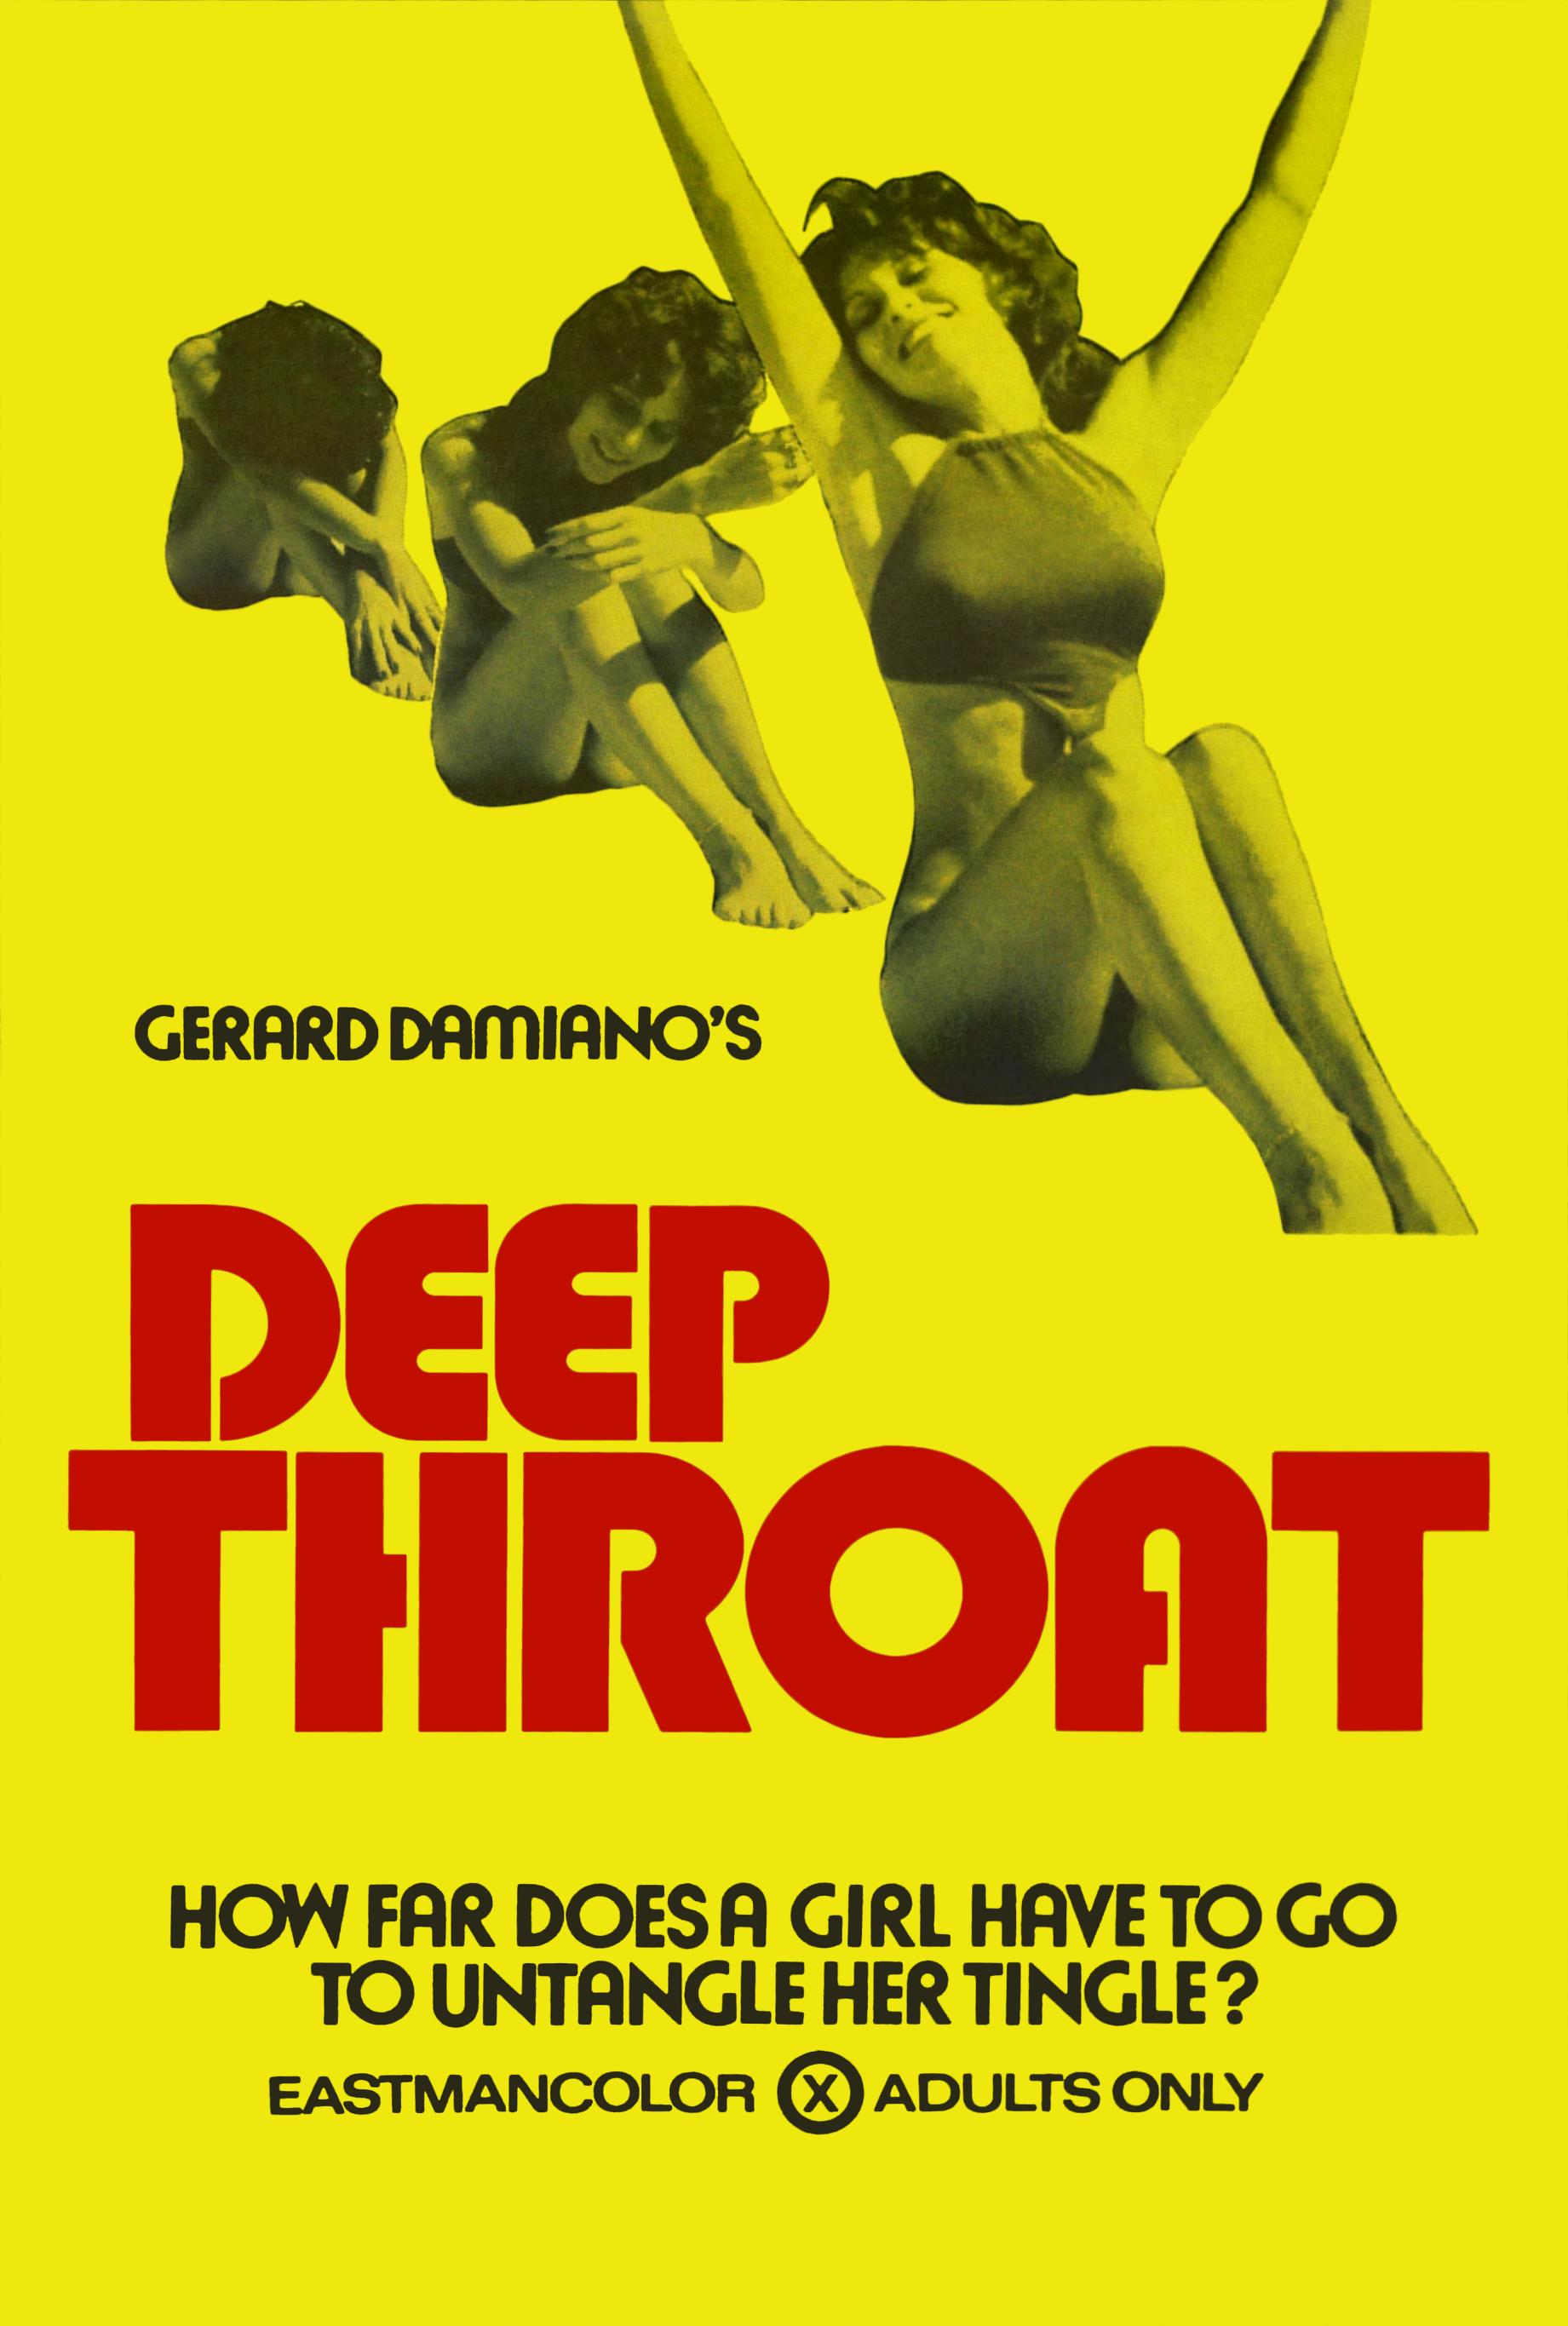 Pelicula Porno Party deep throat (film) - wikipedia